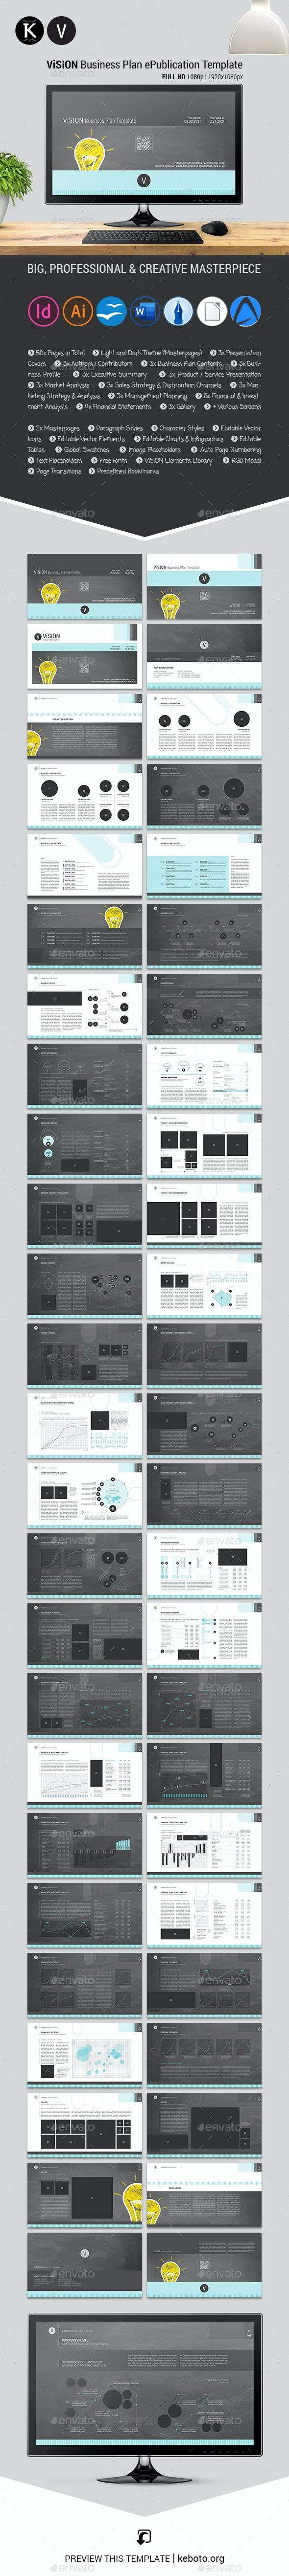 ViSION Business Plan ePublication Template - ePublishing